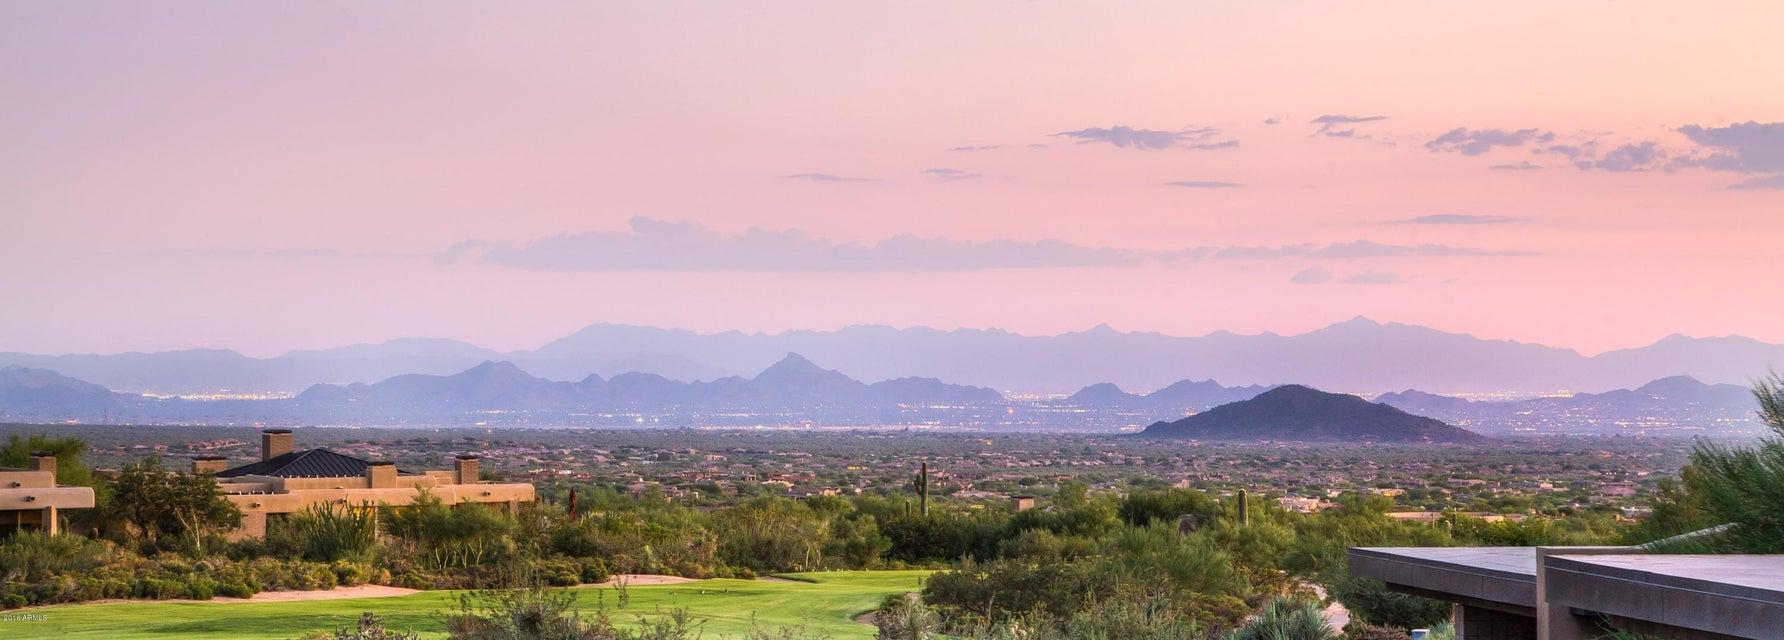 MLS 5496251 39725 N 107TH Way, Scottsdale, AZ 85262 Scottsdale AZ Single-Story